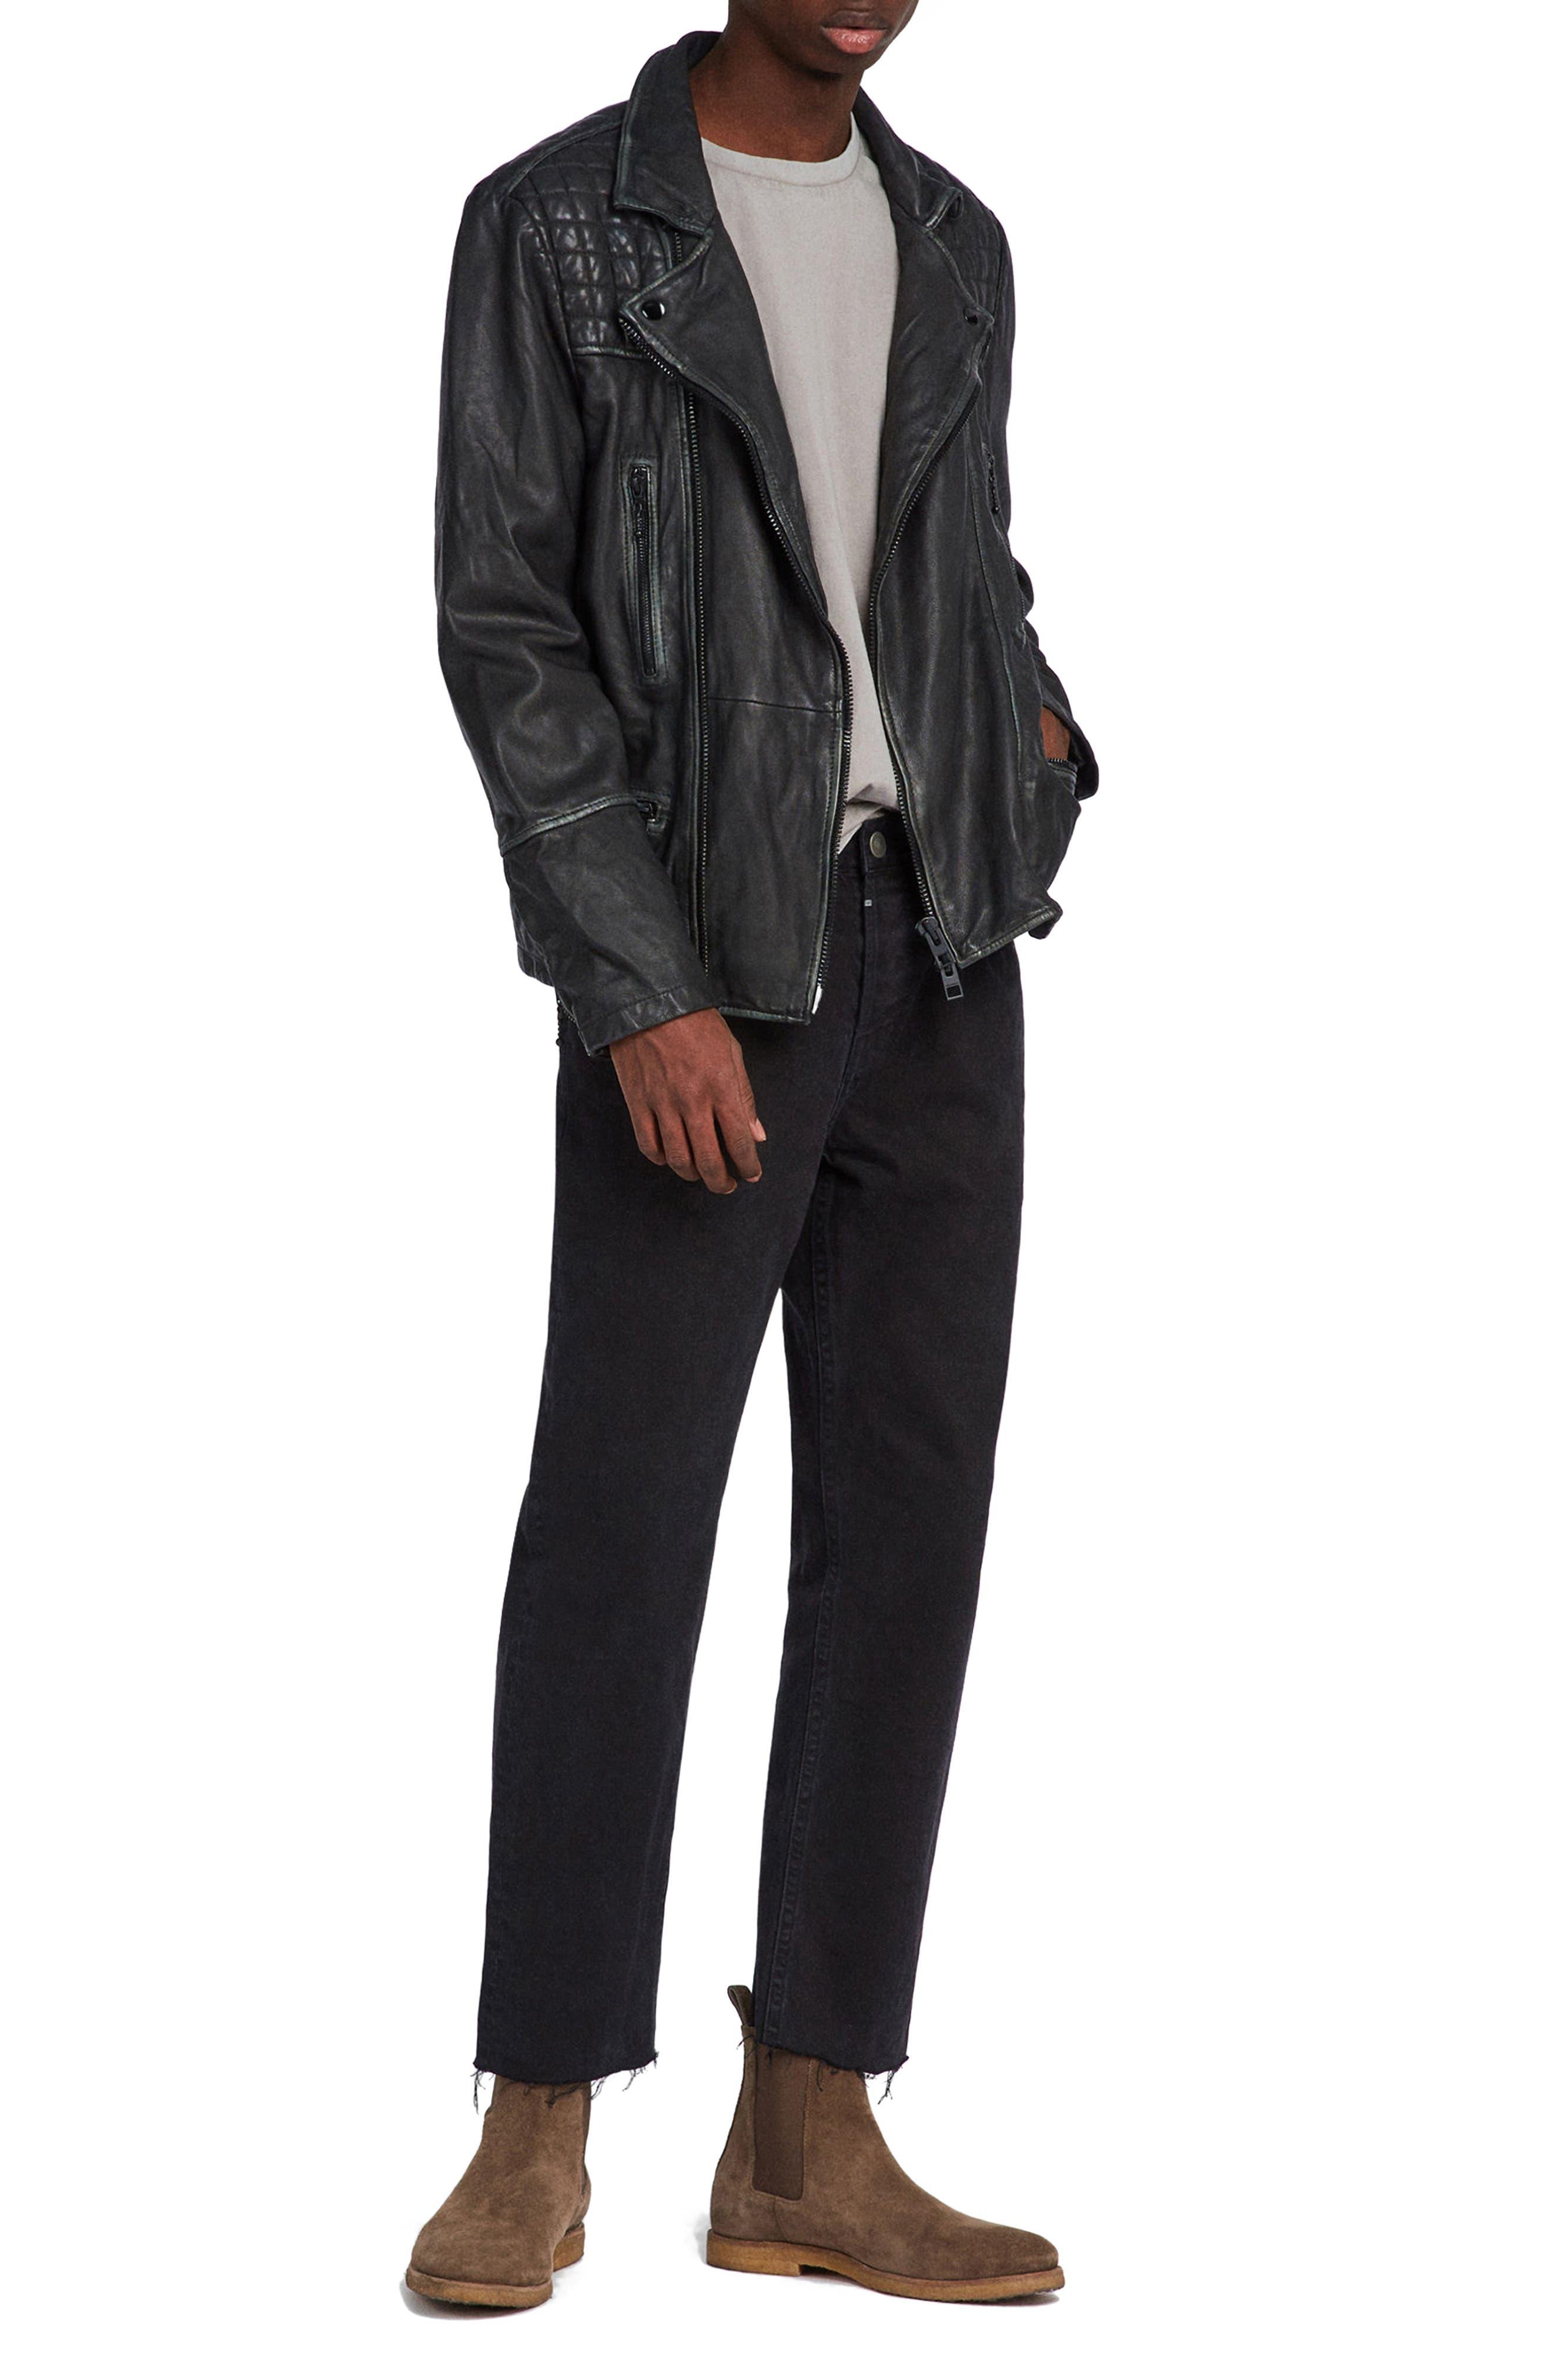 ALLSAINTS, Cargo Biker Slim Fit Leather Jacket, Alternate thumbnail 7, color, BLACK GREY